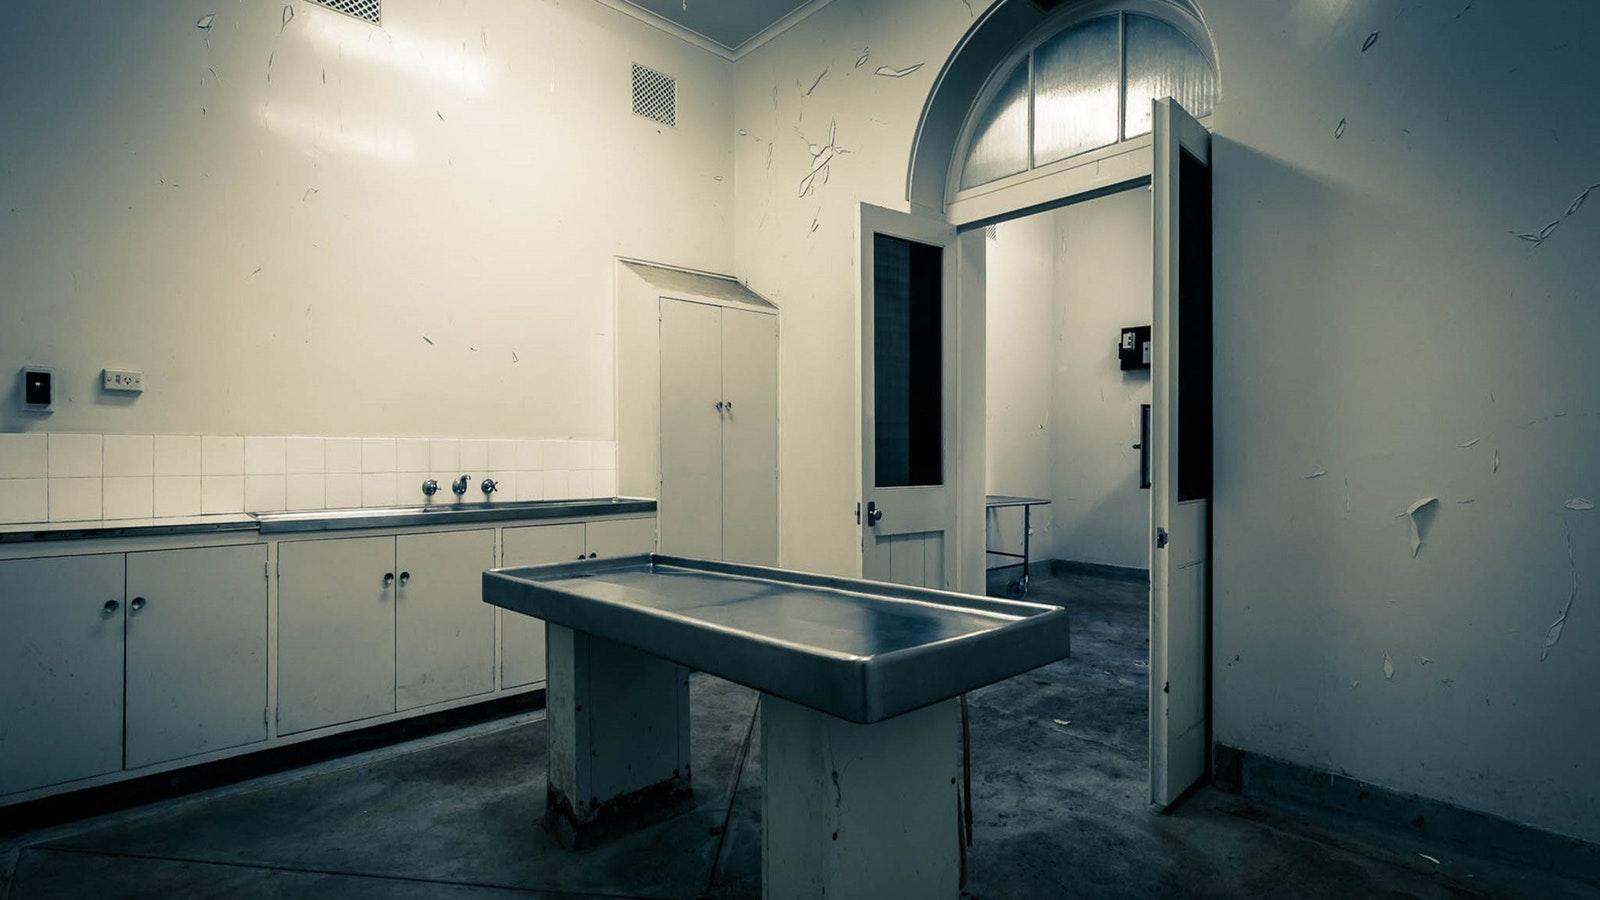 Aradale morgue